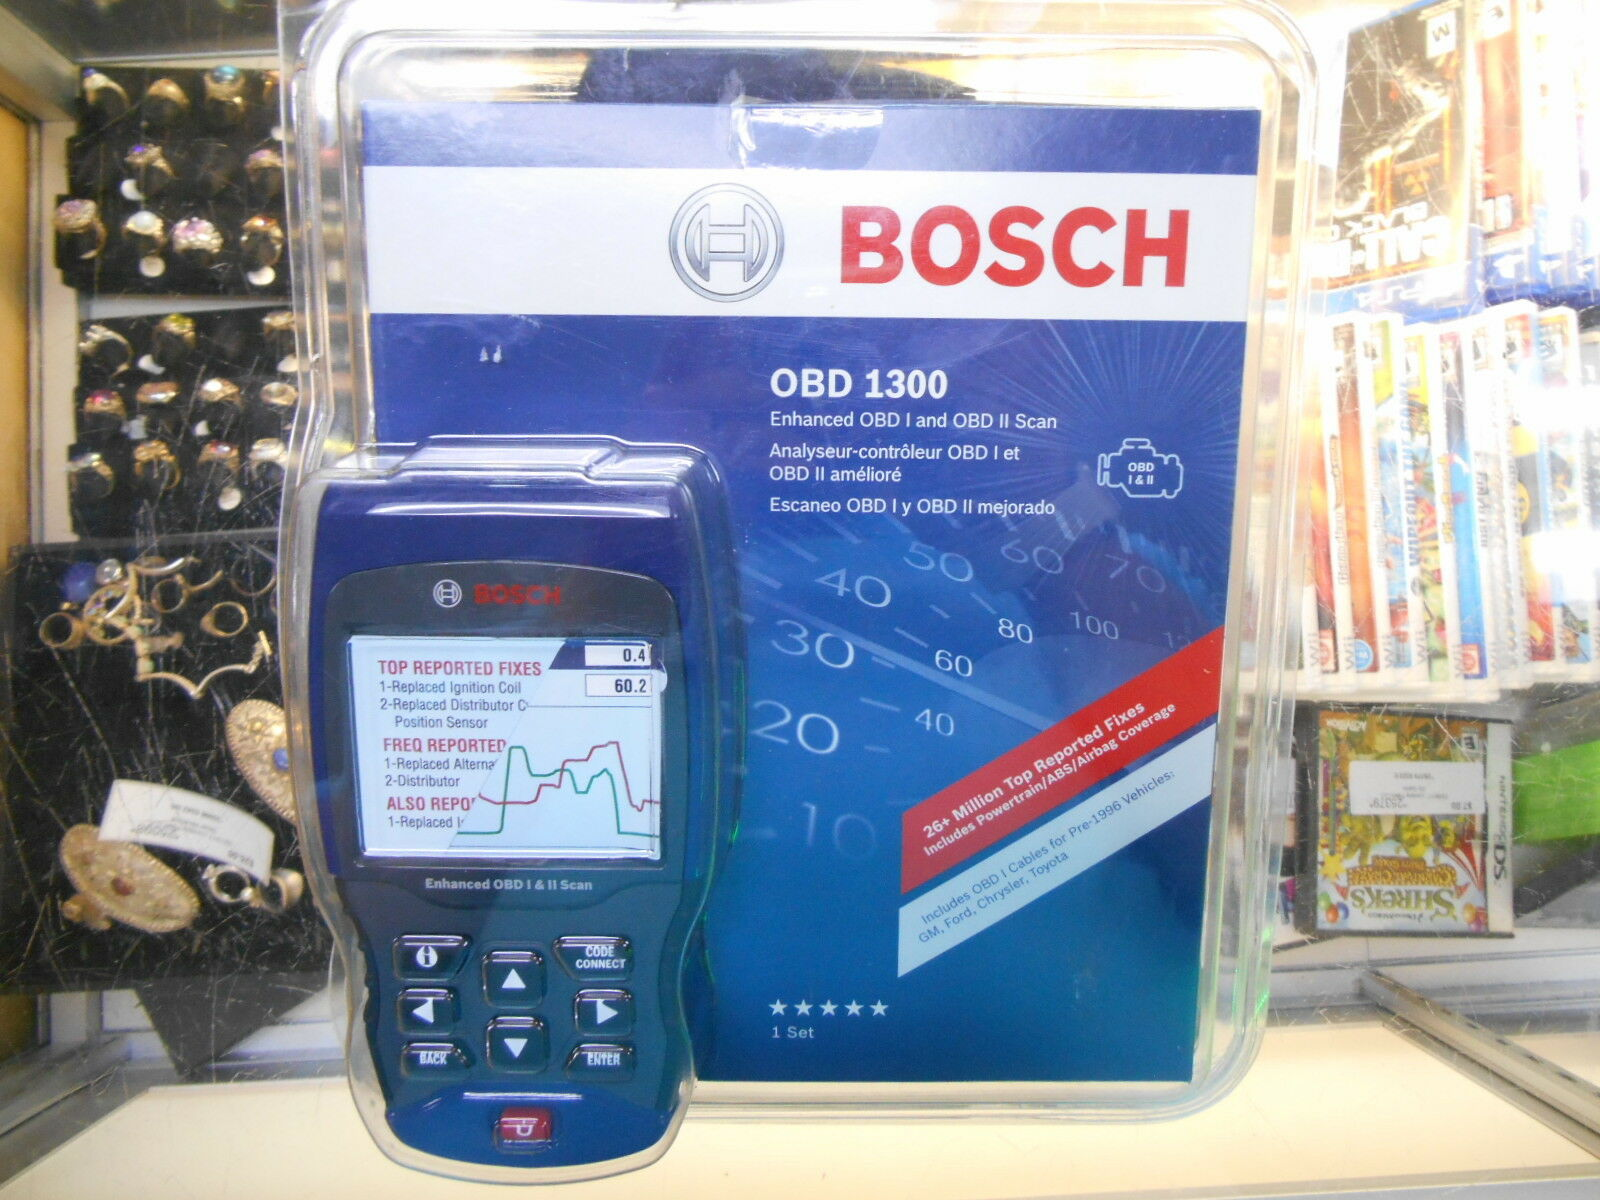 new bosch obd 1300 scan reader new for sale in hampton georgia usa vehicles. Black Bedroom Furniture Sets. Home Design Ideas